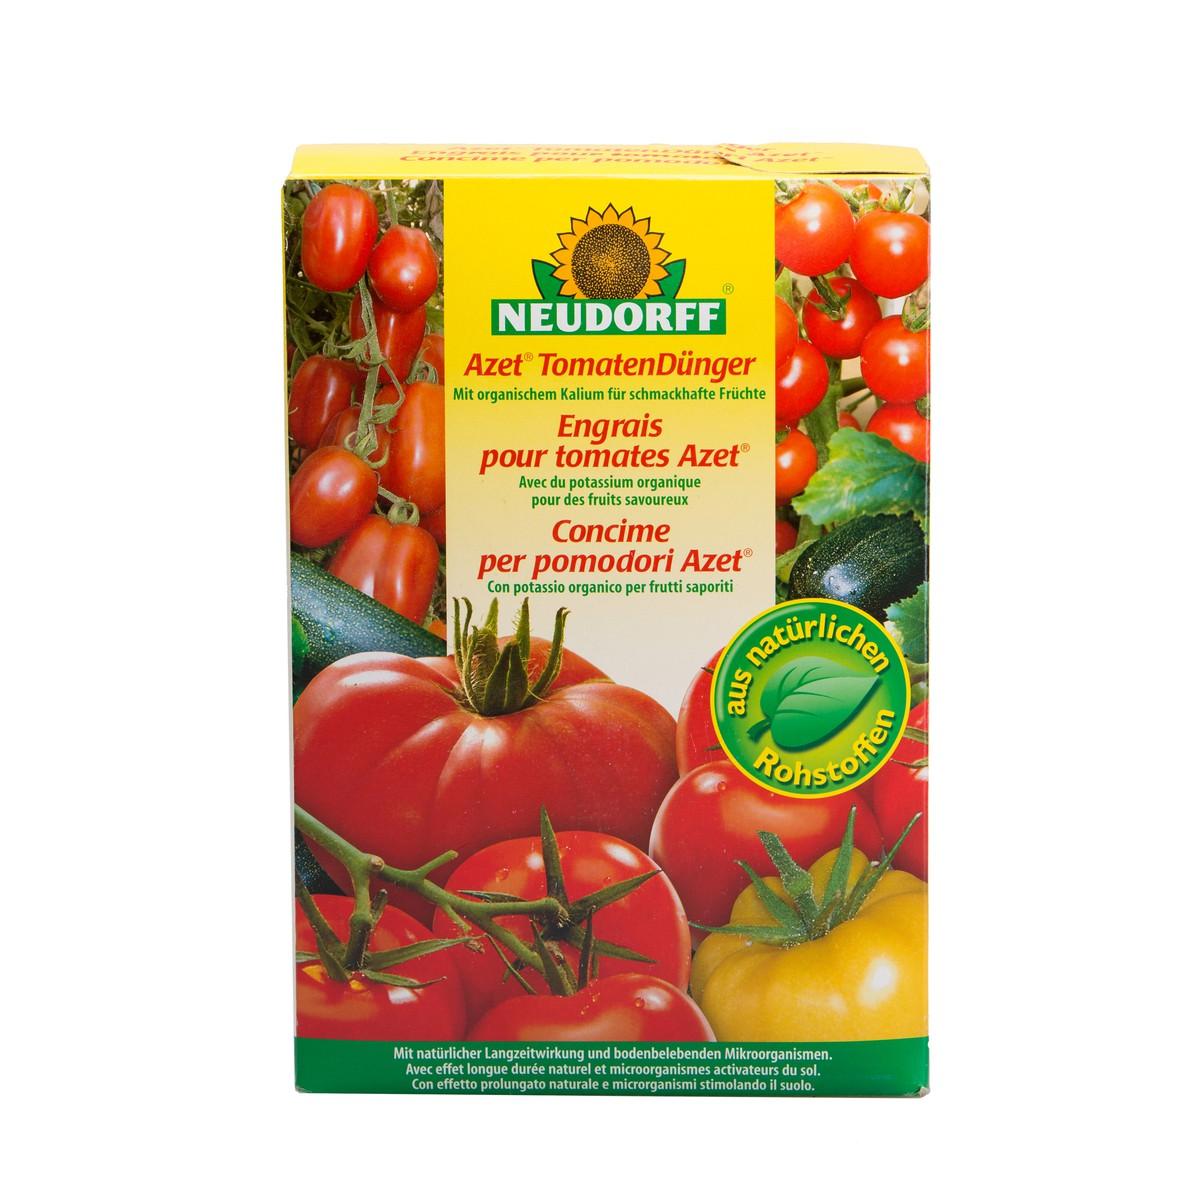 neudorf engrais pour tomates neudorff 2 5 kg schilliger. Black Bedroom Furniture Sets. Home Design Ideas